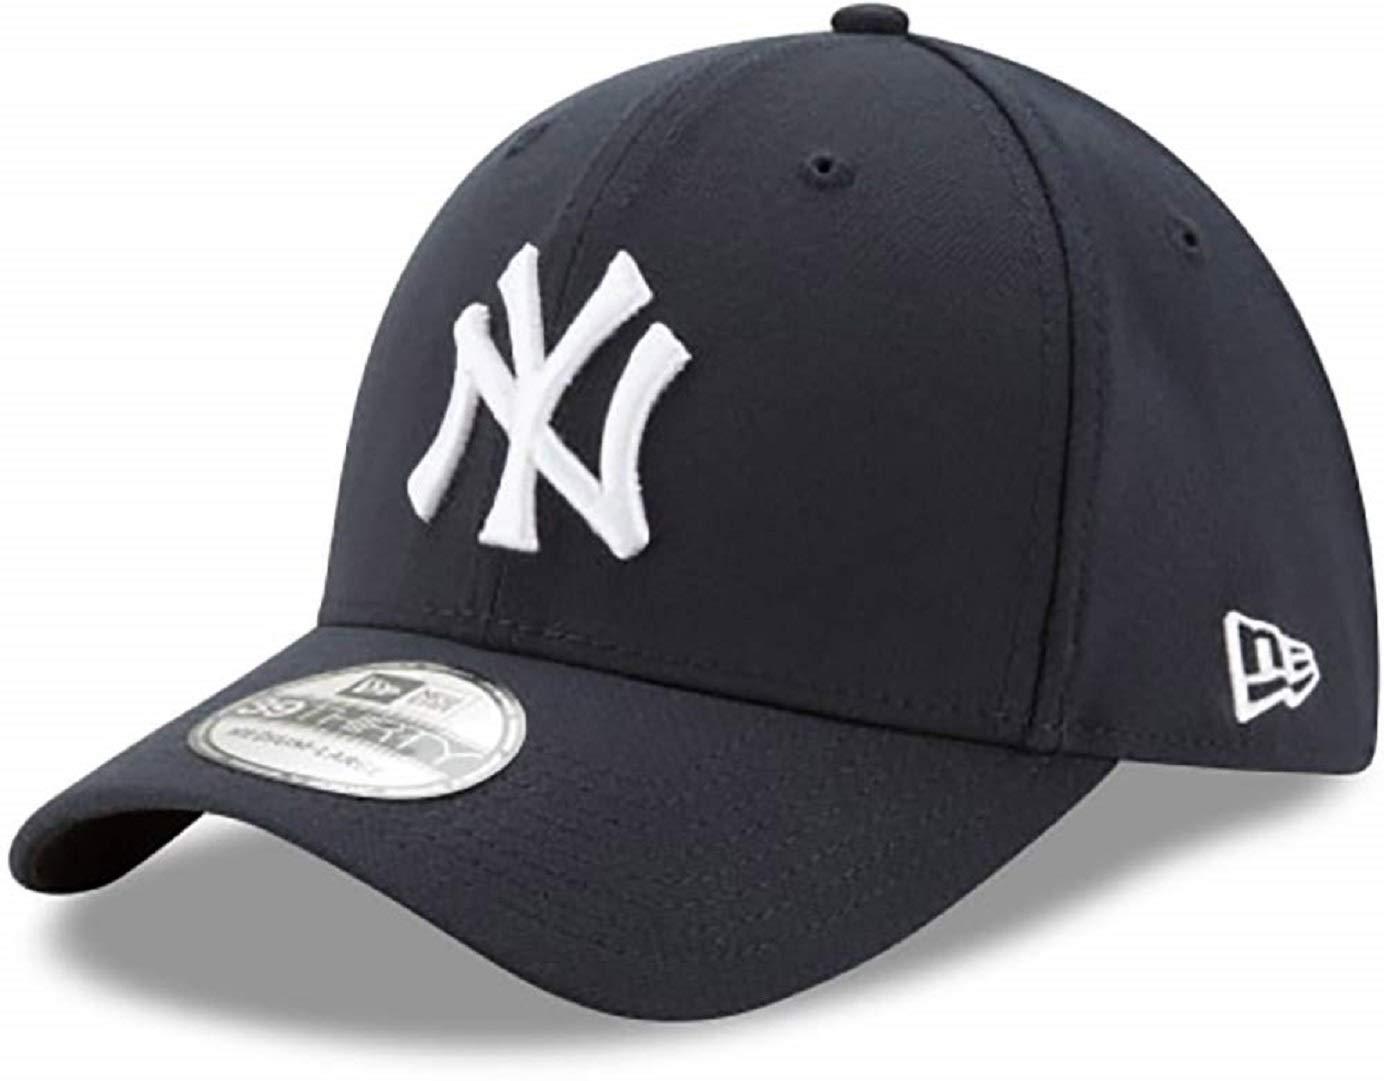 09e6c46df New Era 39Thirty New York Yankees Game Team Classic Hat (Navy) MLB Cap